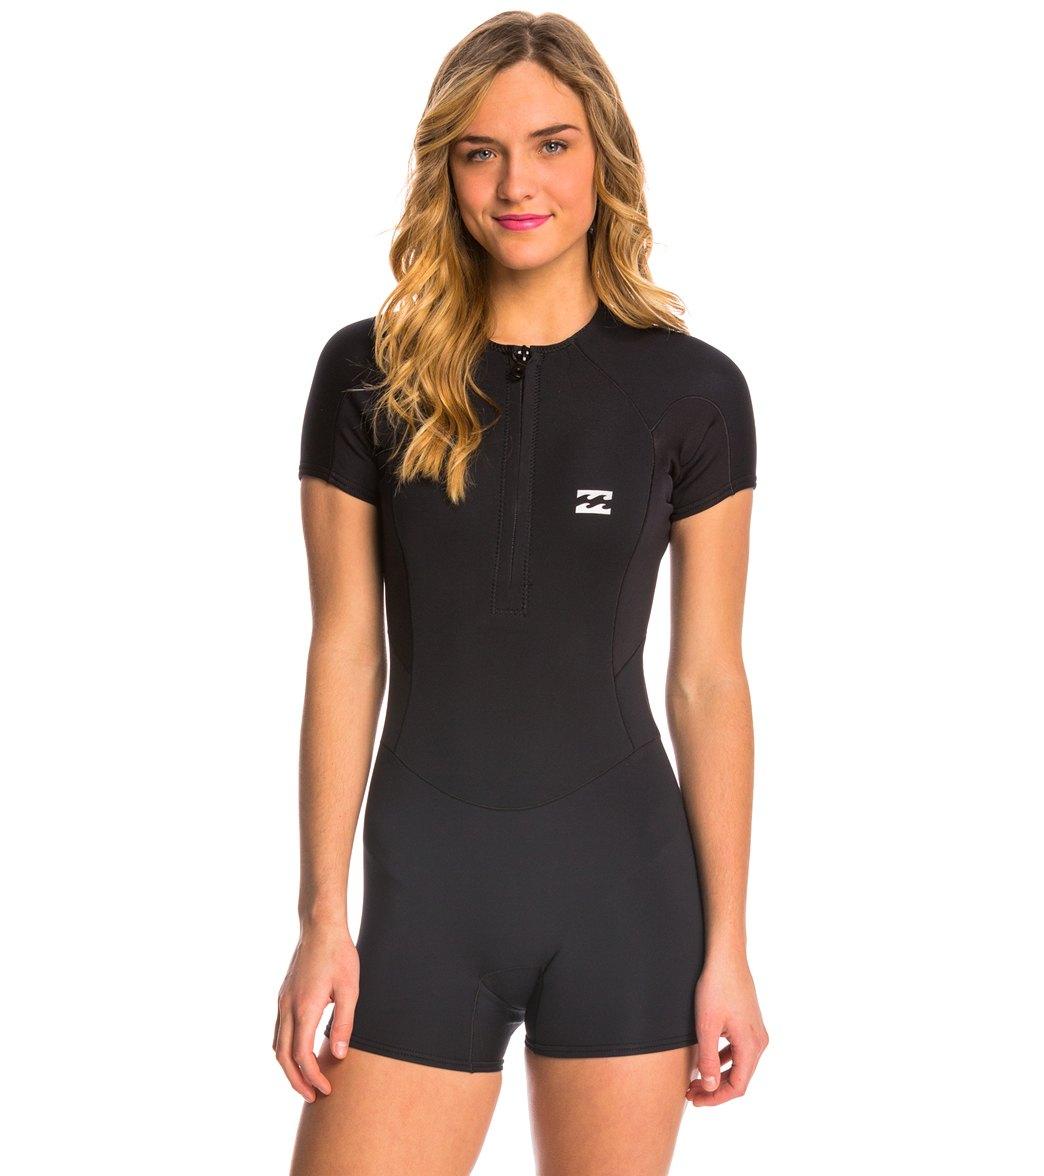 fd188bb6e5 ... Billabong Women s 1mm Synergy Front Zip Cap Sleeve Spring Suit Wetsuit  Play Video. MODEL MEASUREMENTS